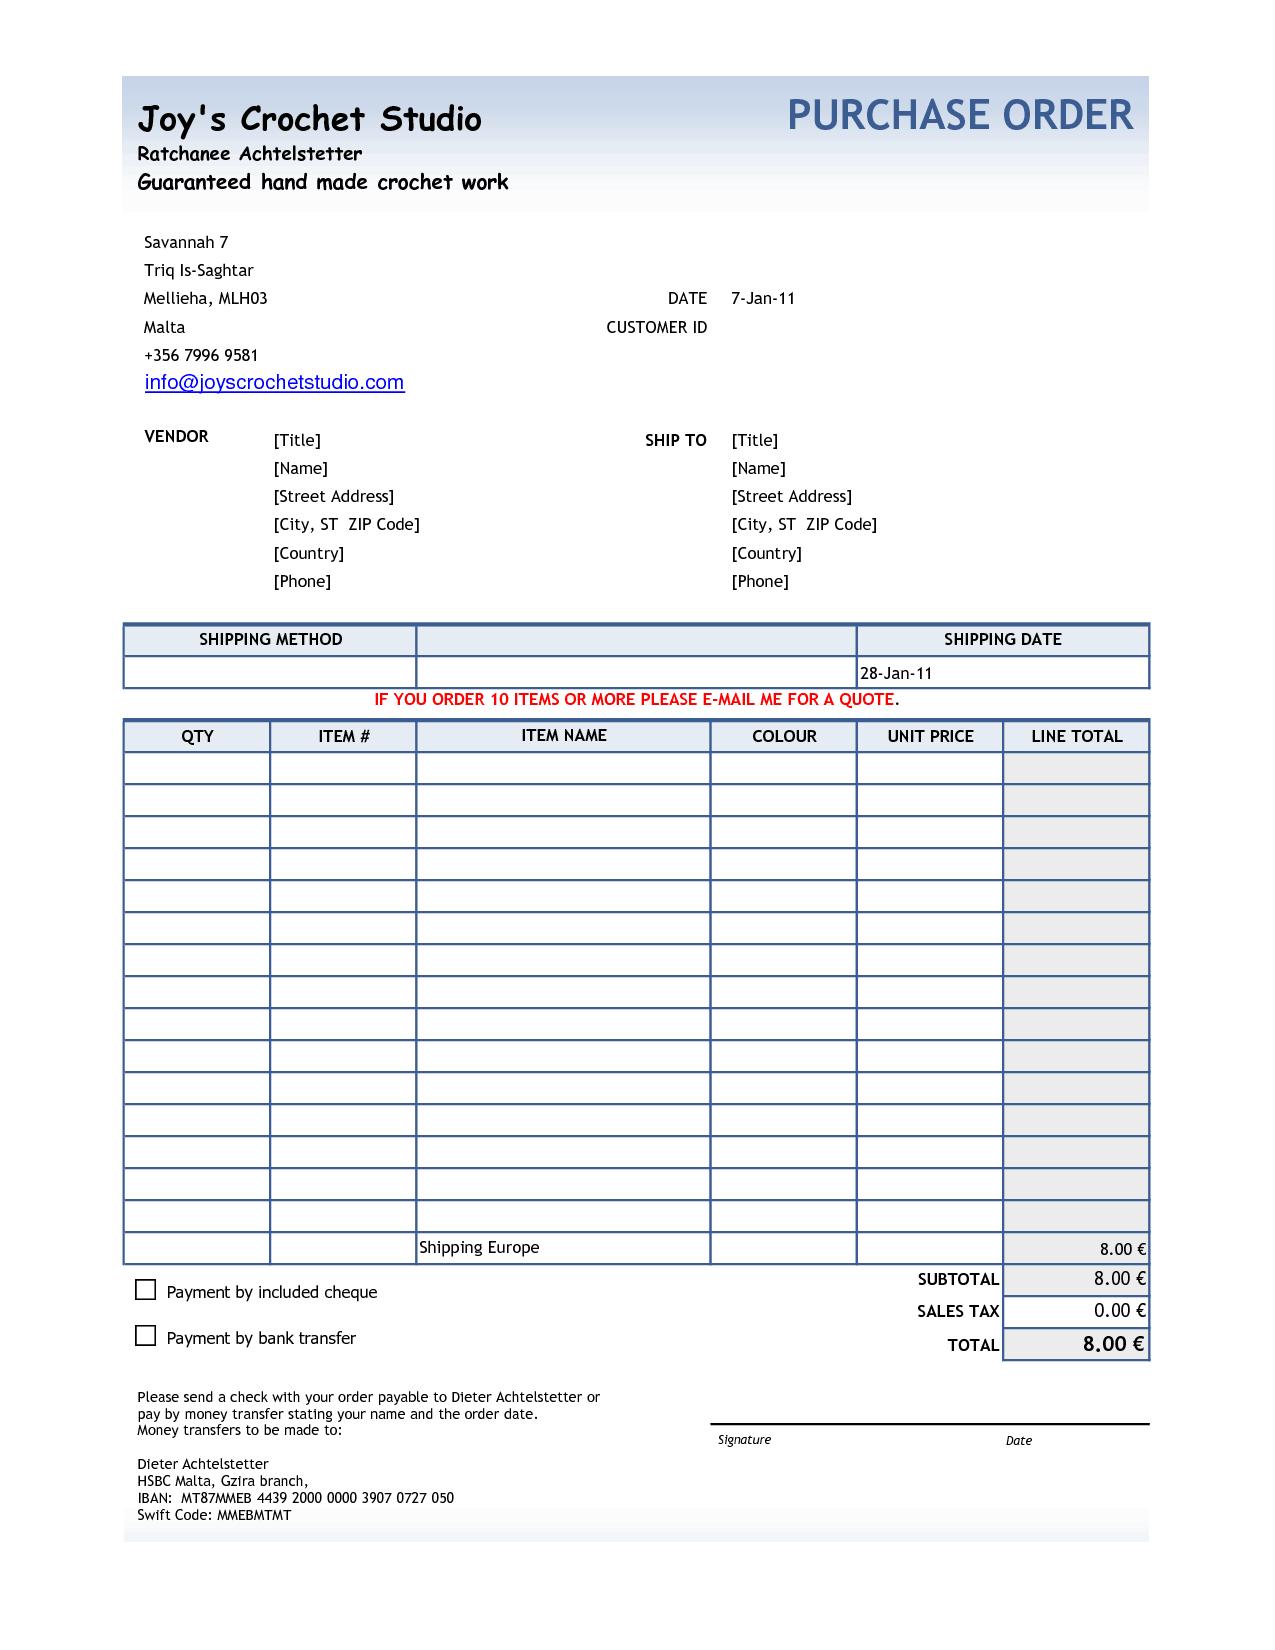 Purchase Order sample 20.13641